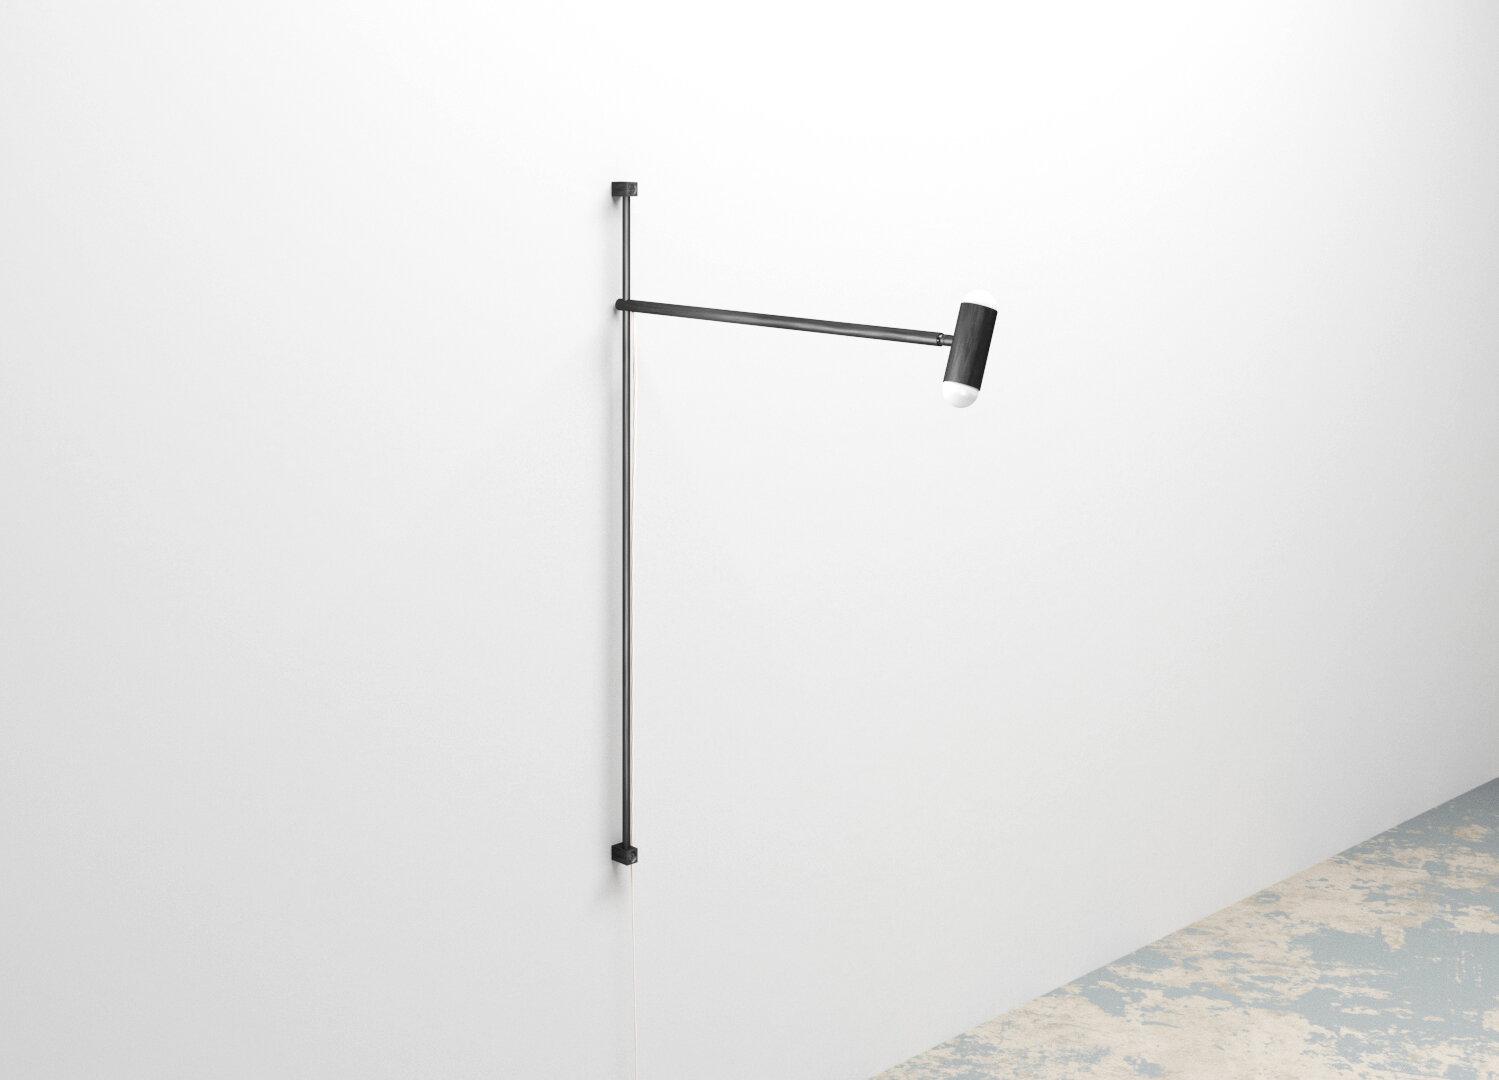 Olivr_Studio_Swing_Arm_Lamp2.jpg